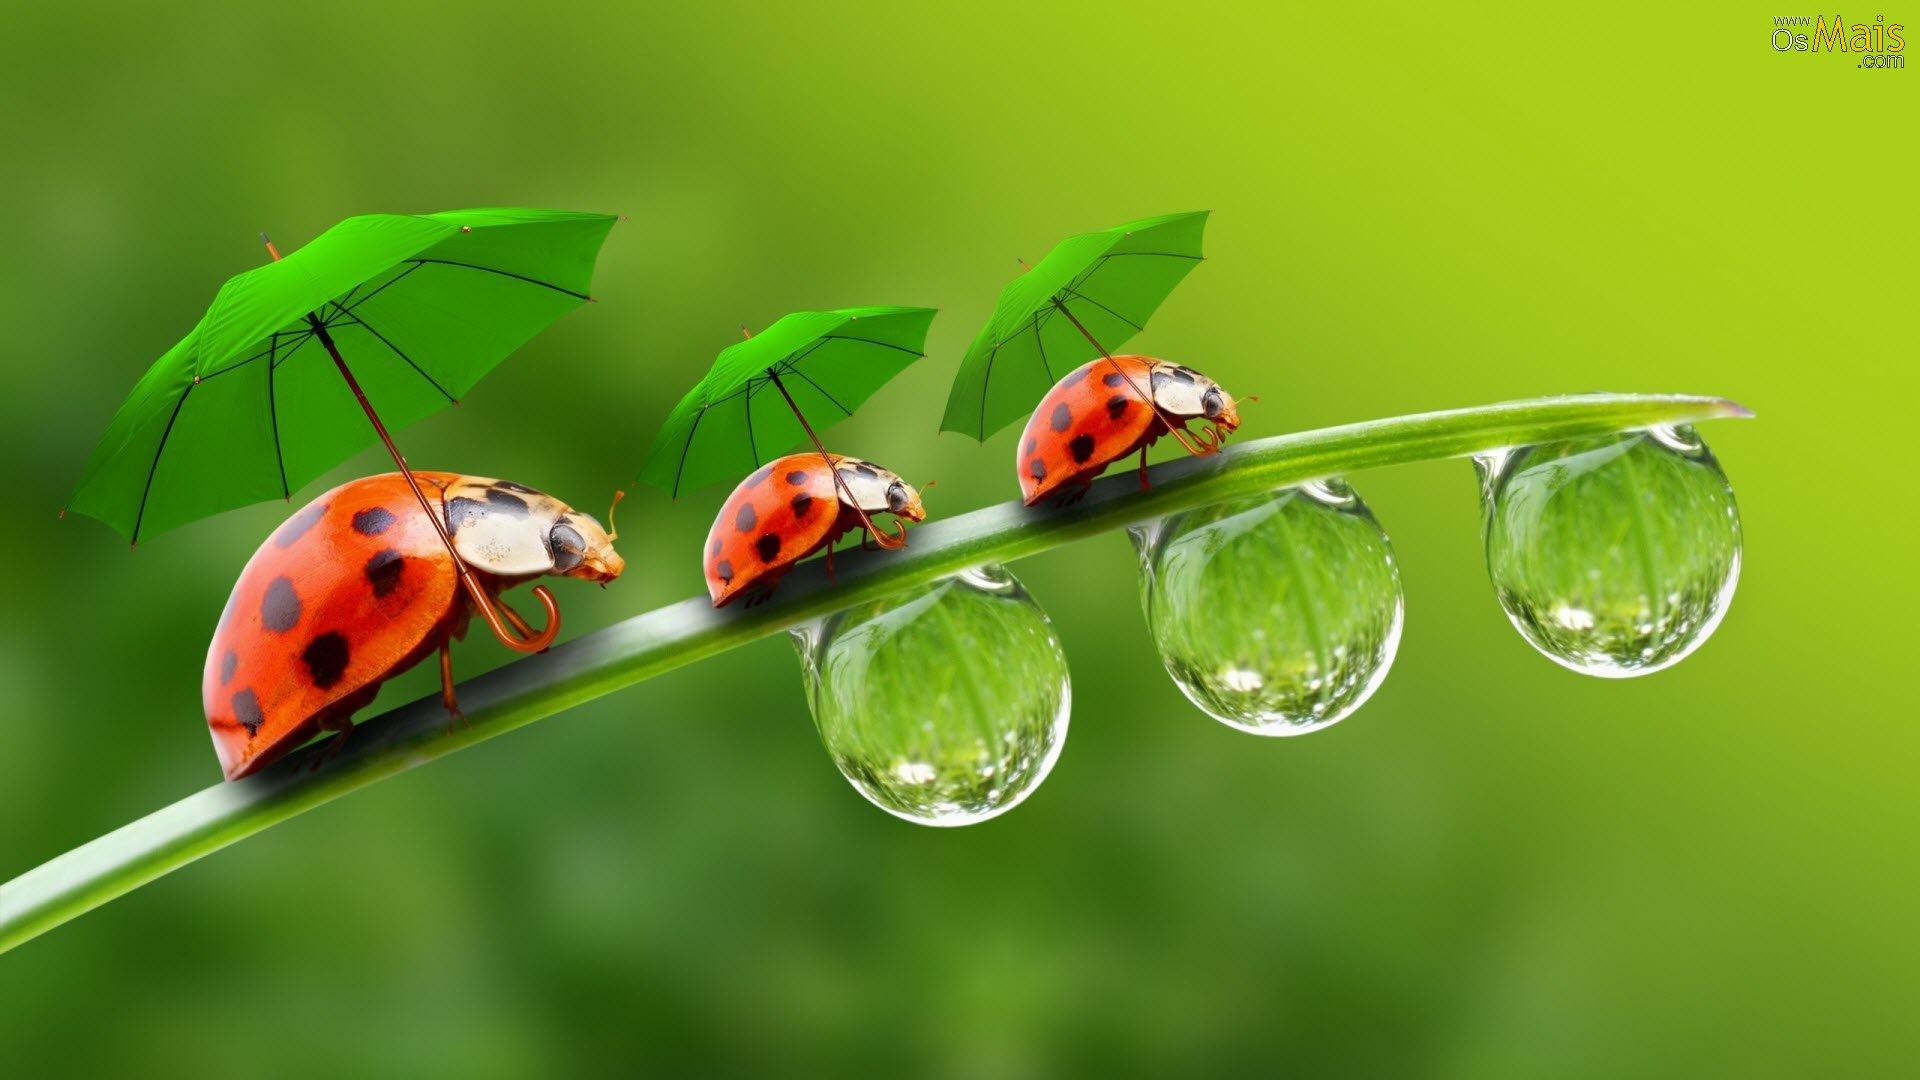 Proteger as plantas-joaninhas